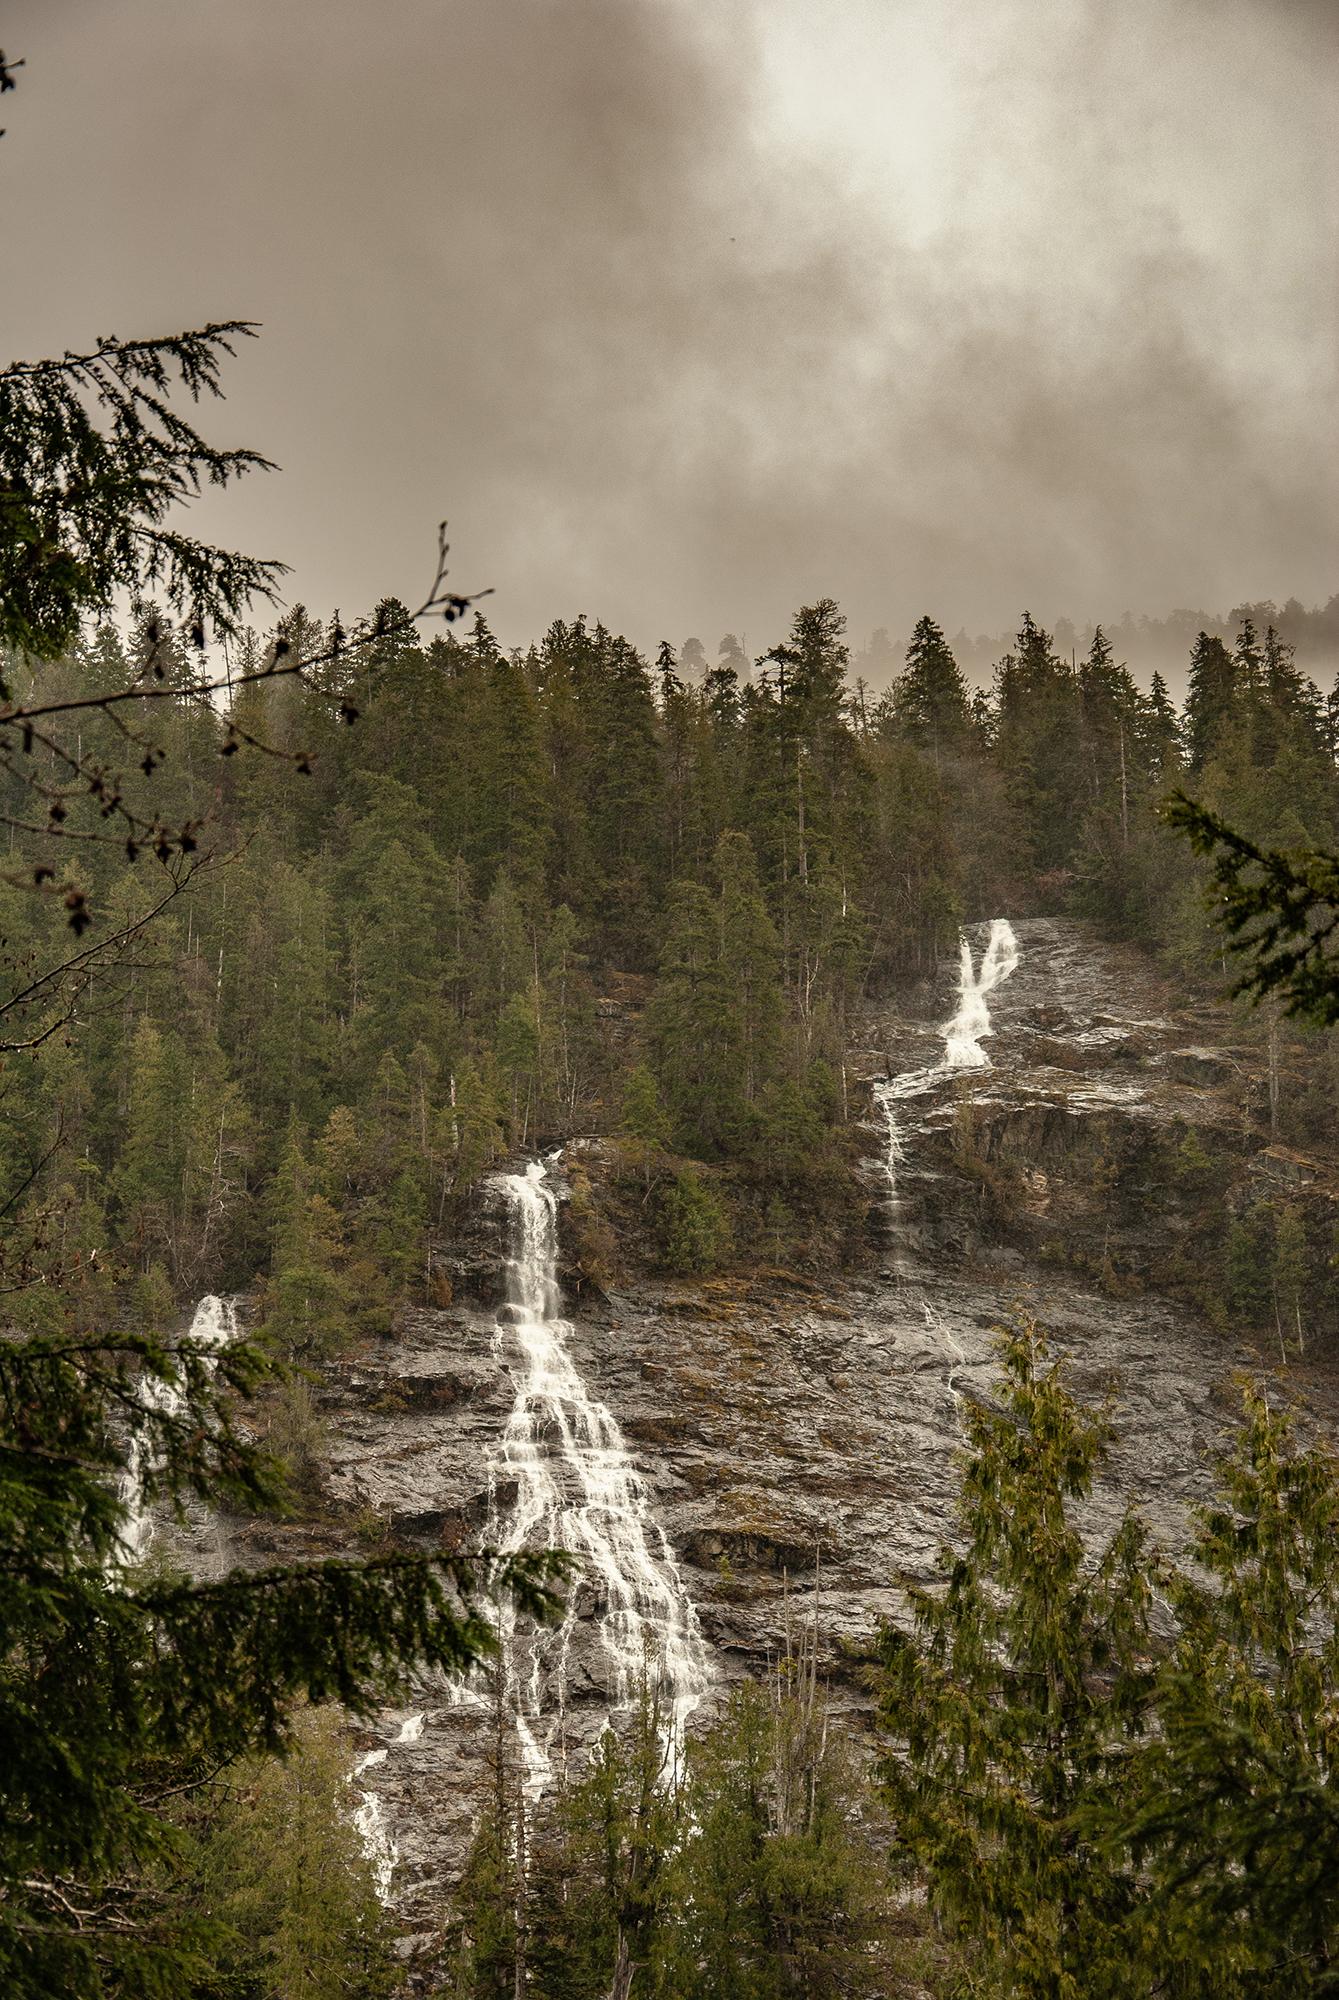 Generic Van Life - The Ultimate Vancouver Island Road Trip - Three Sisters Waterfall